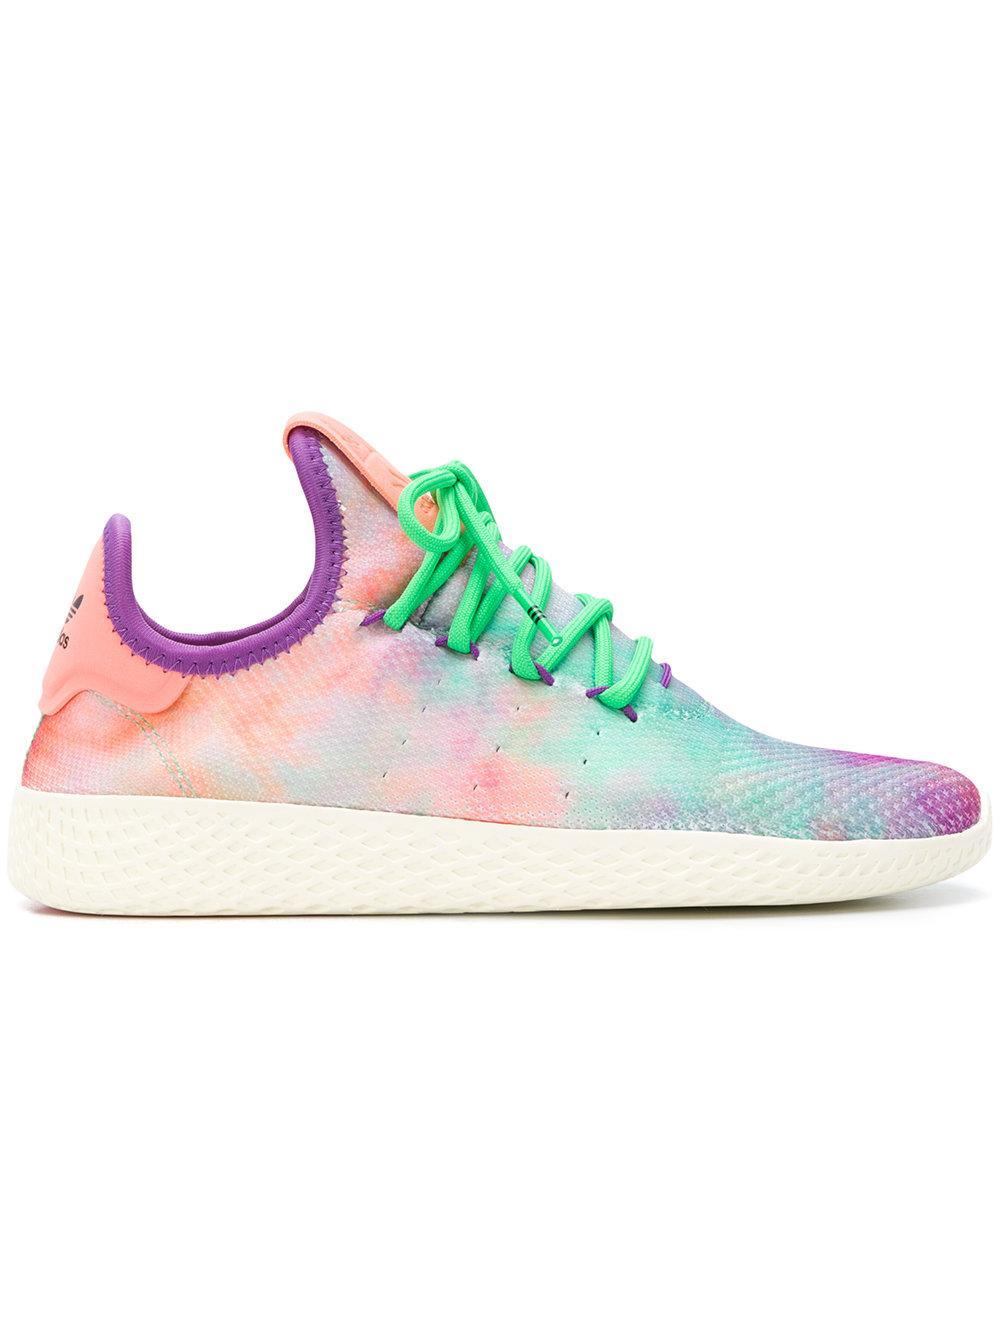 9fe8737cb Adidas Originals Adidas Pharrell Williams Hu Holi Tennis Hu Mc Sneakers -  Multicolour